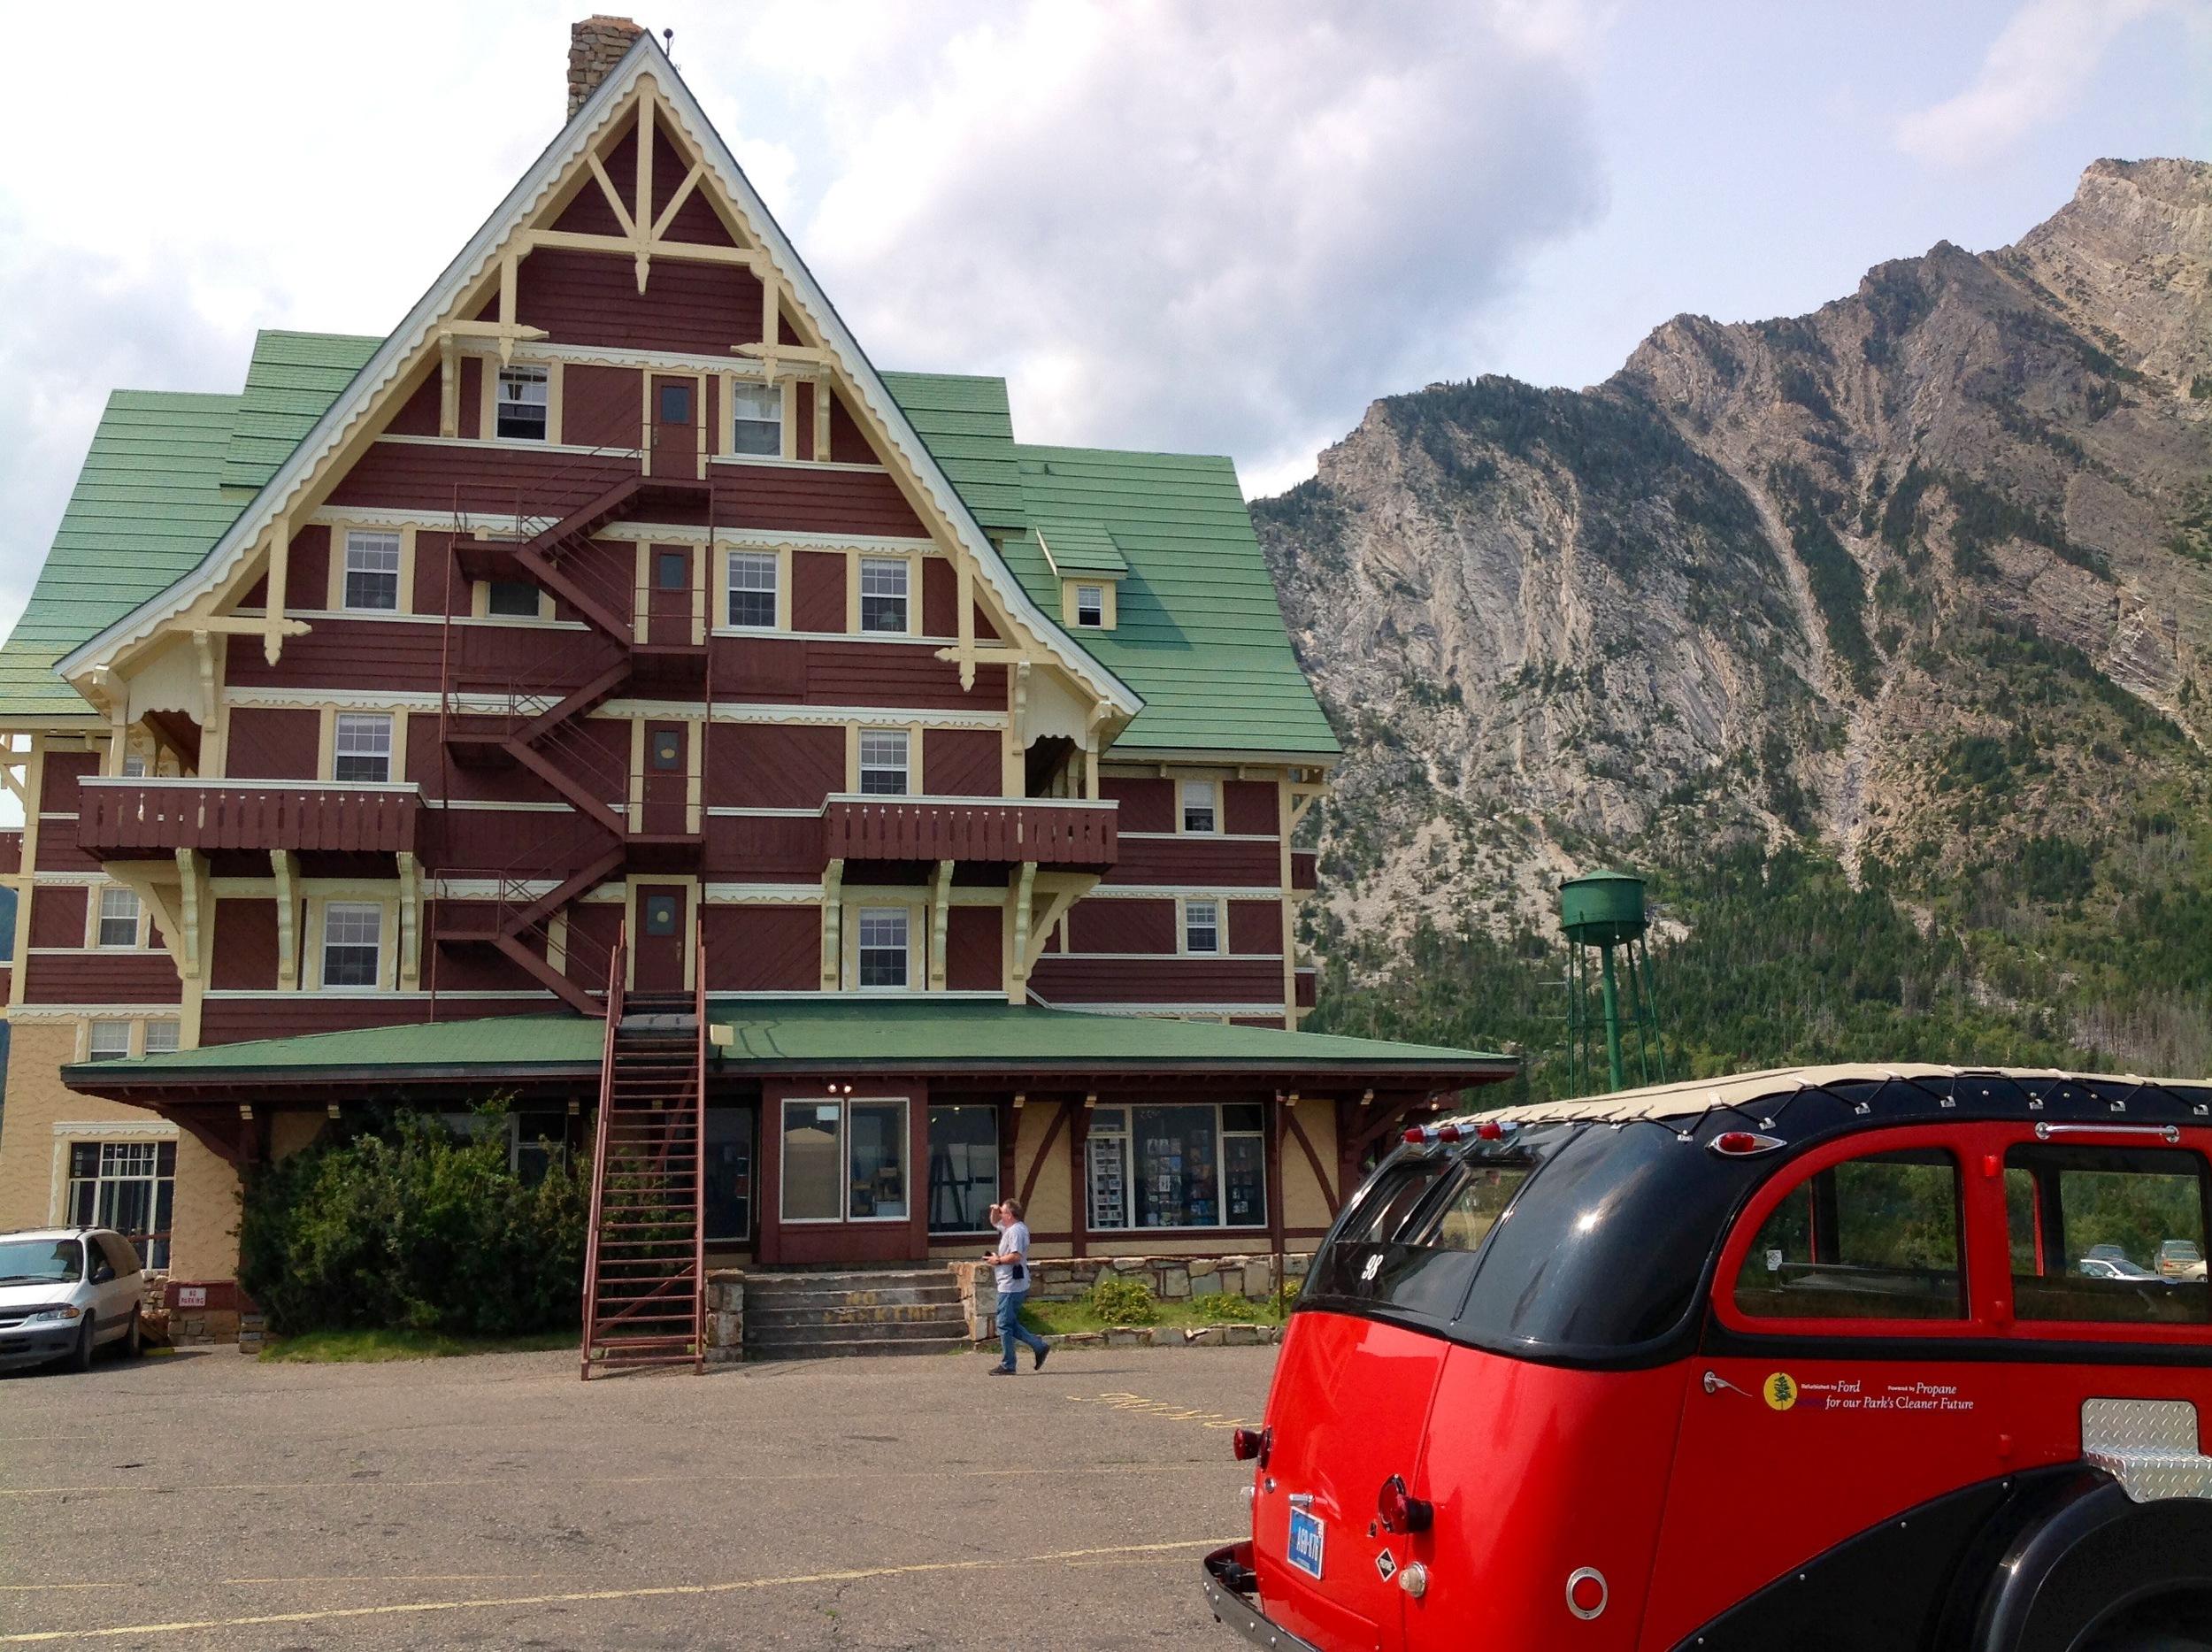 Prince of Wales Hotel, Waterton, Alberta